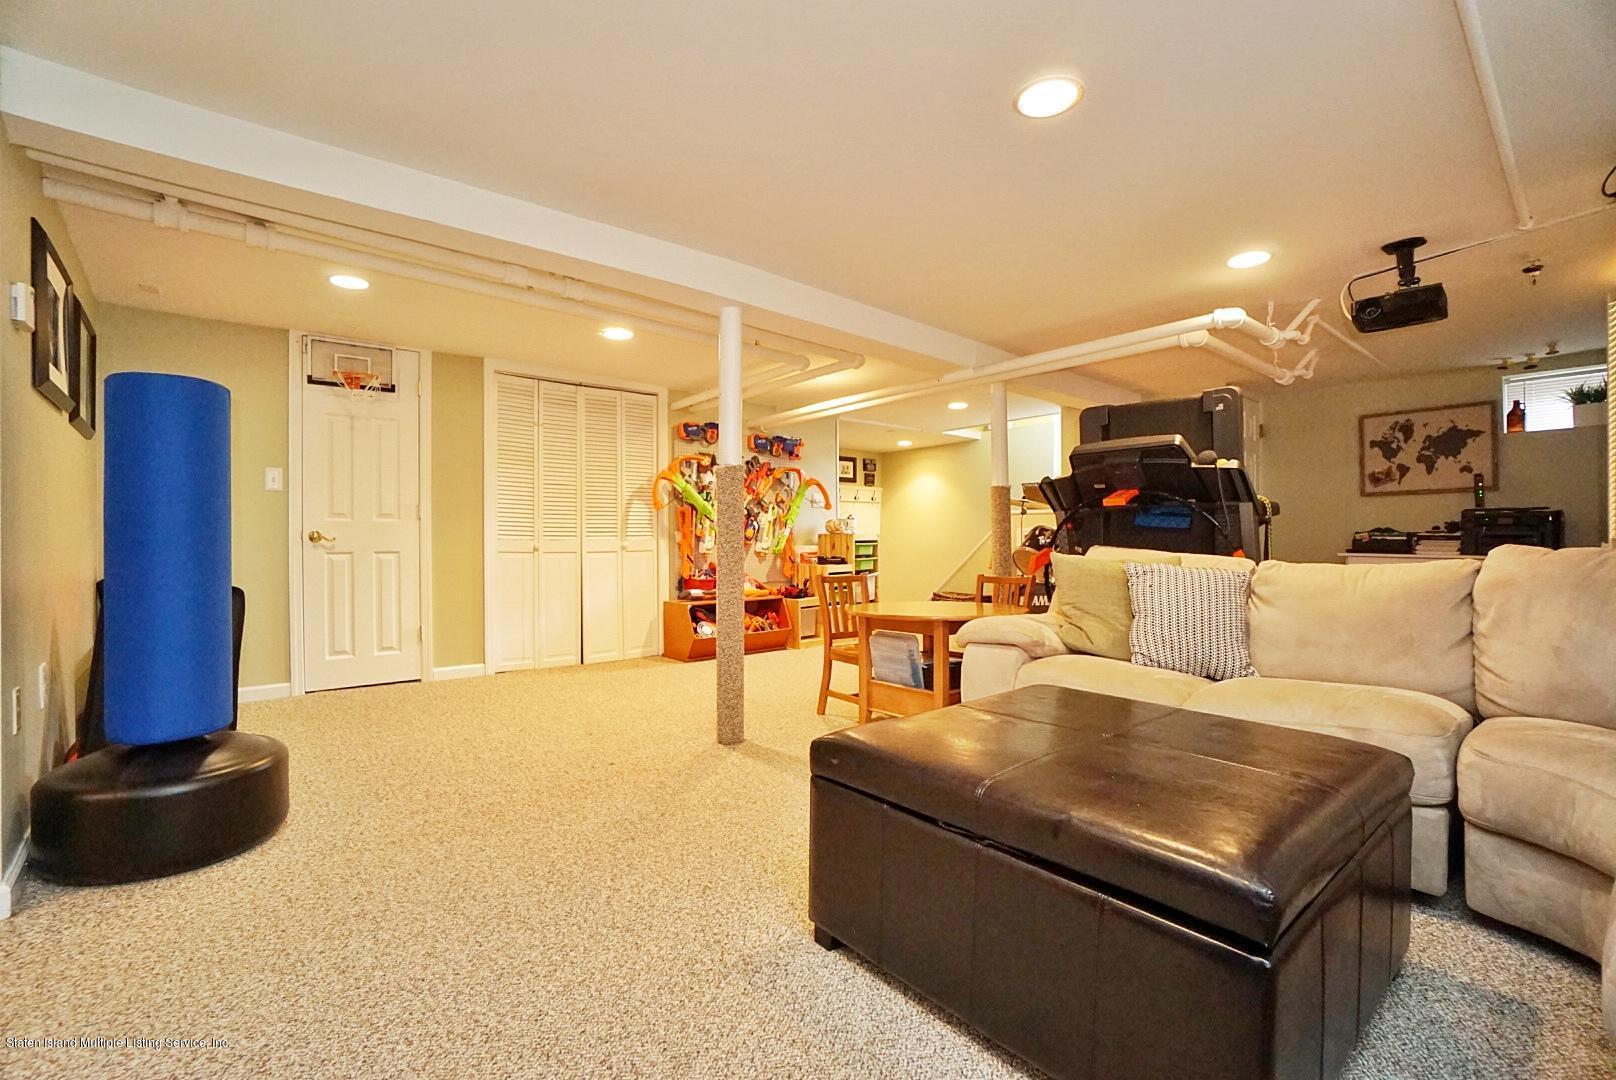 Single Family - Detached 171 Keiber Court  Staten Island, NY 10314, MLS-1127425-34